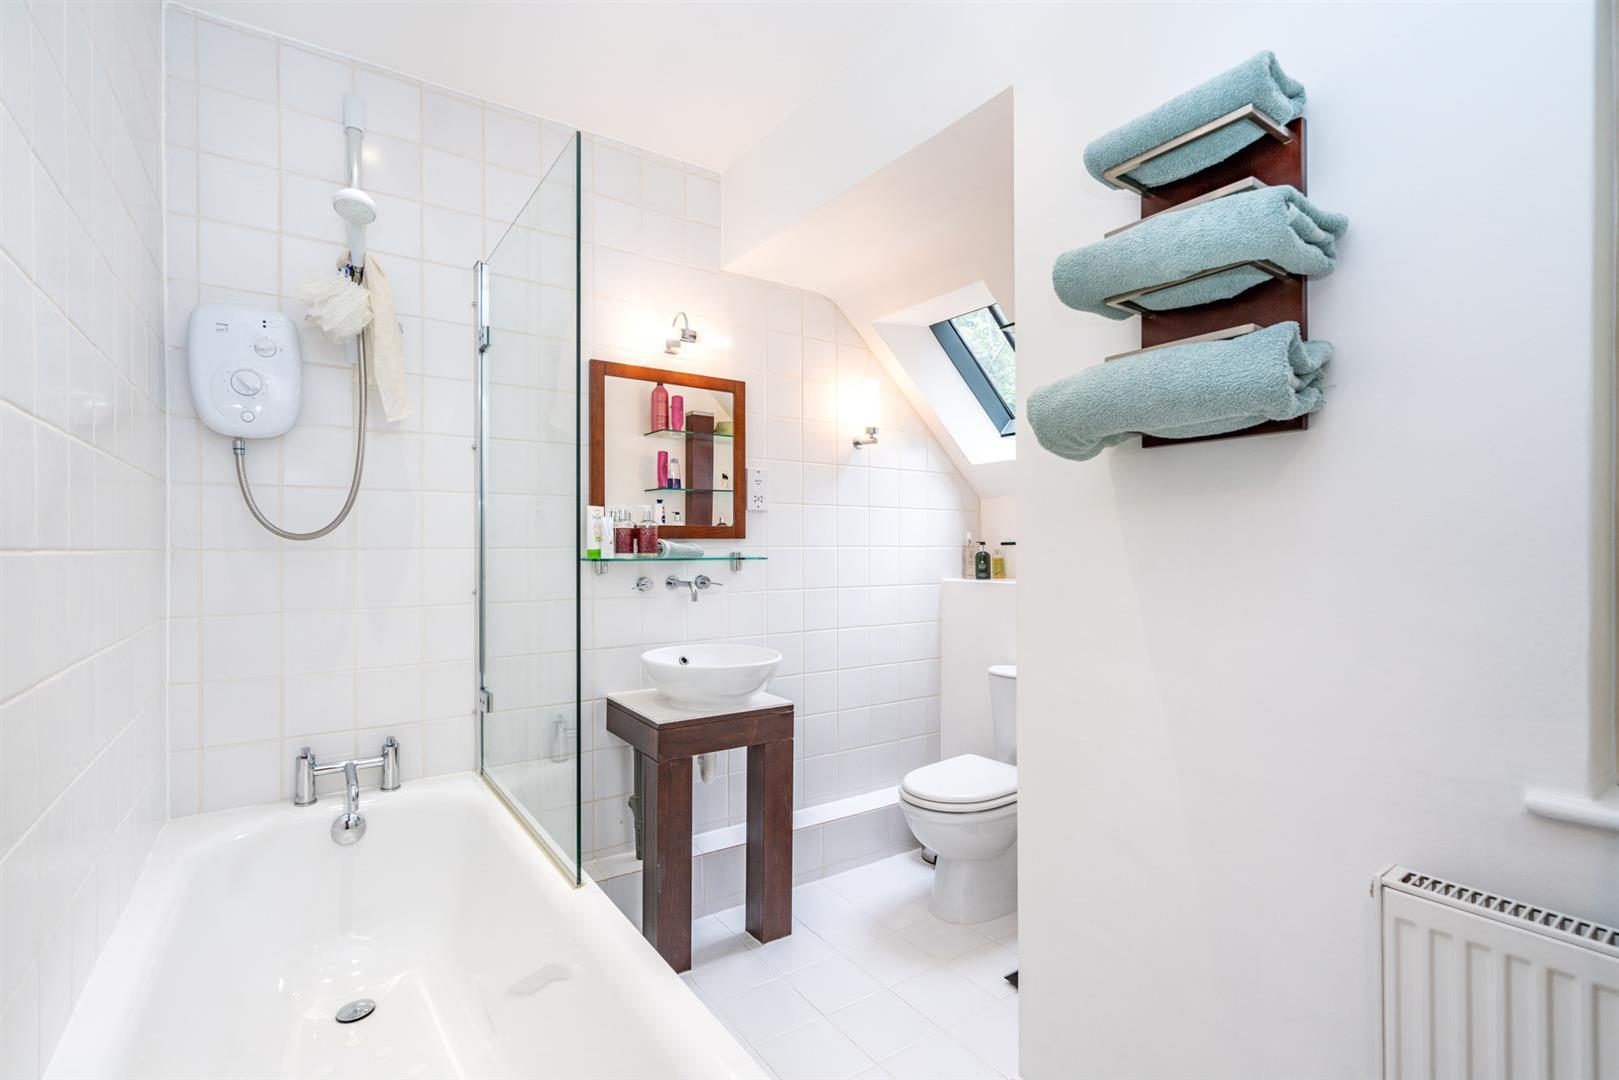 14-Chesham-Road-1391 - bathroom.jpg